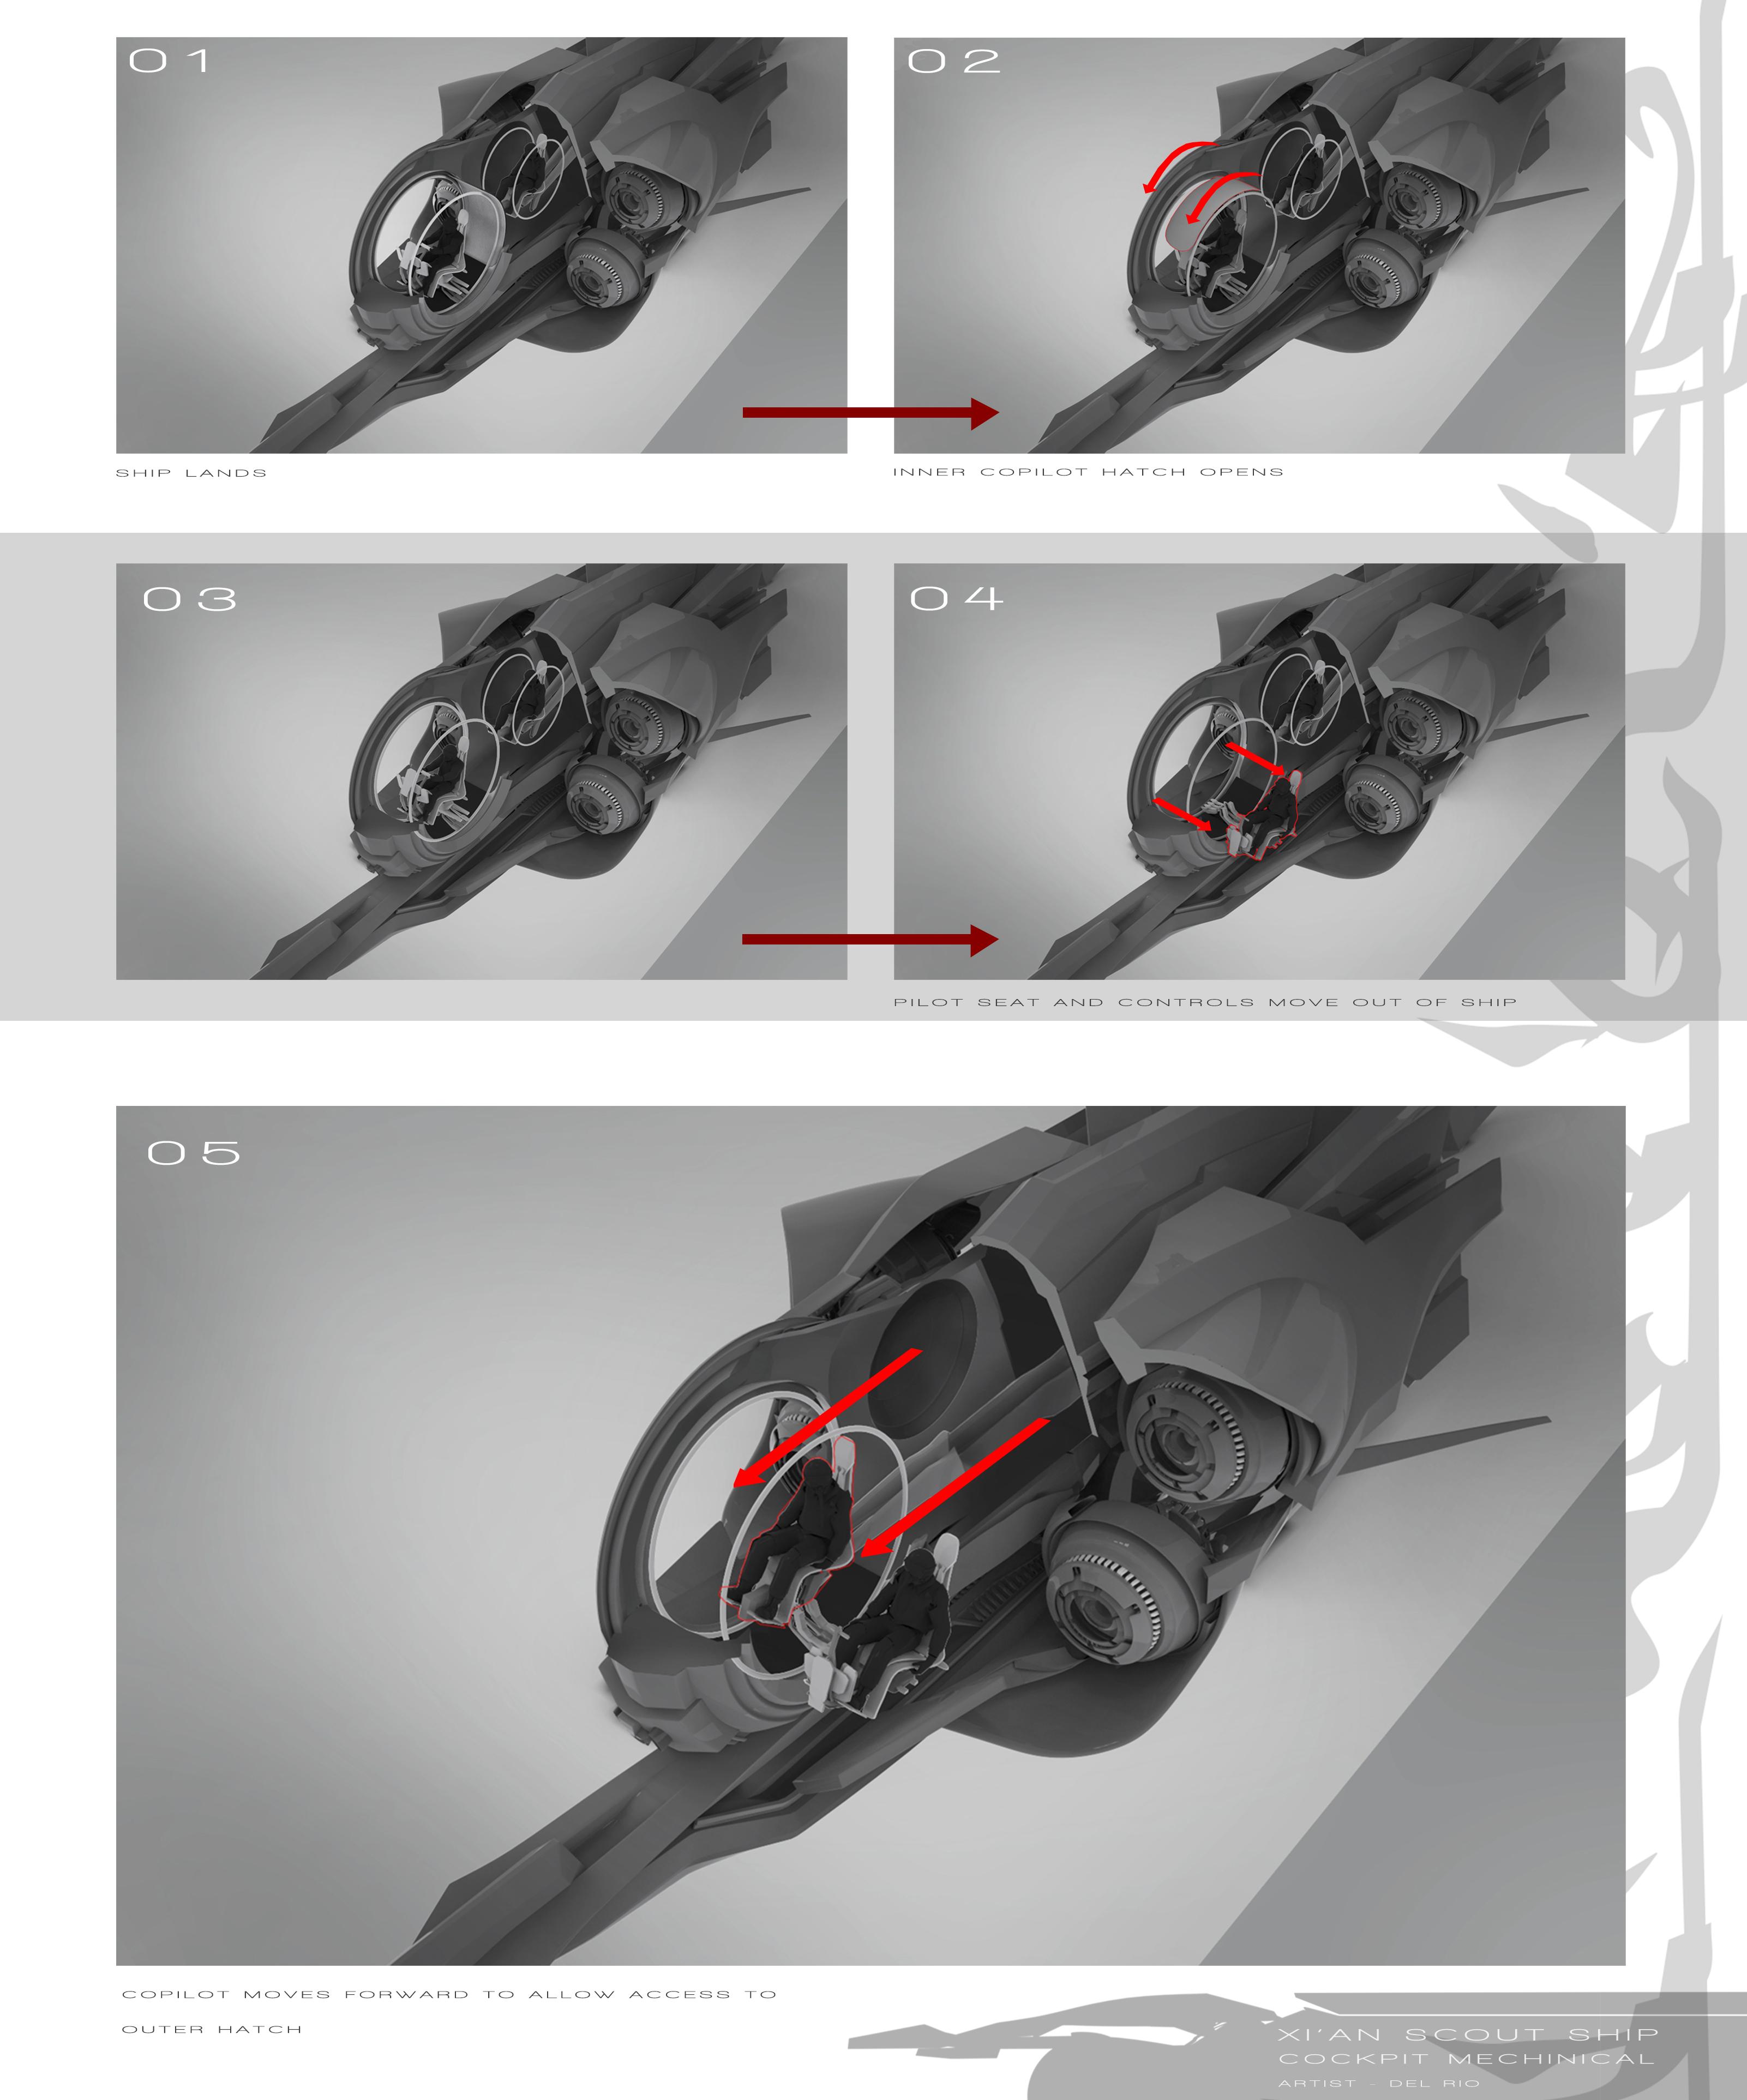 Xian_scout_ship_cockpit_workings.jpg